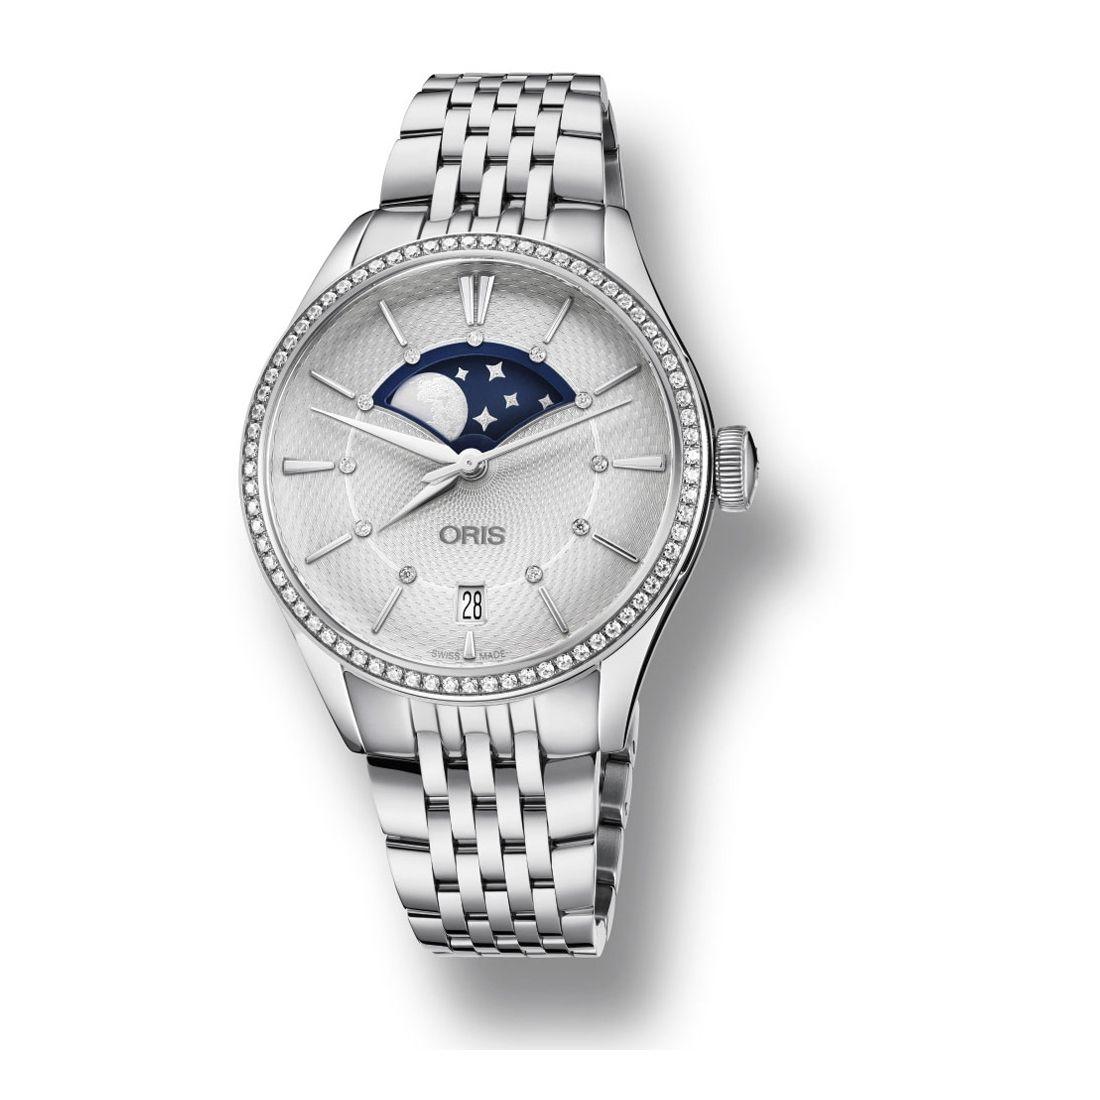 Reloj Oris Artelier Grande Lune Diamonds 01 763 7723 4951-07 8 18 79  - 1